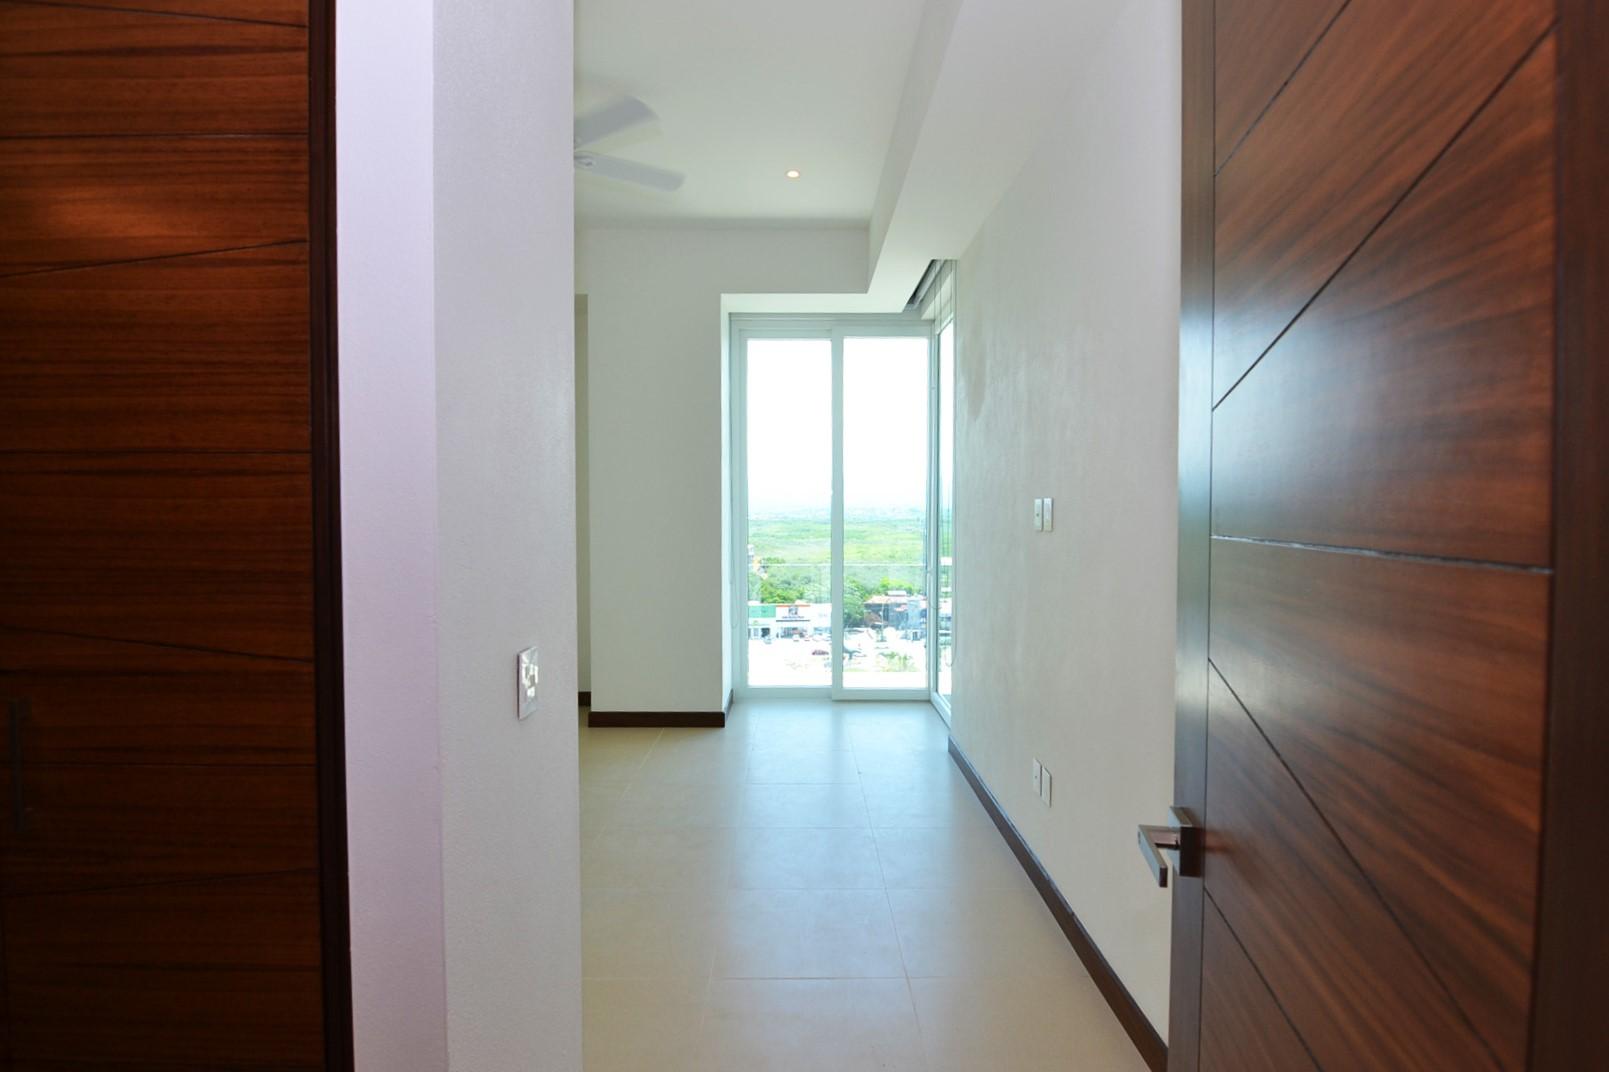 Condo VMarina PH10 - Puerto Vallarta Luxury Condo For Rent (14)